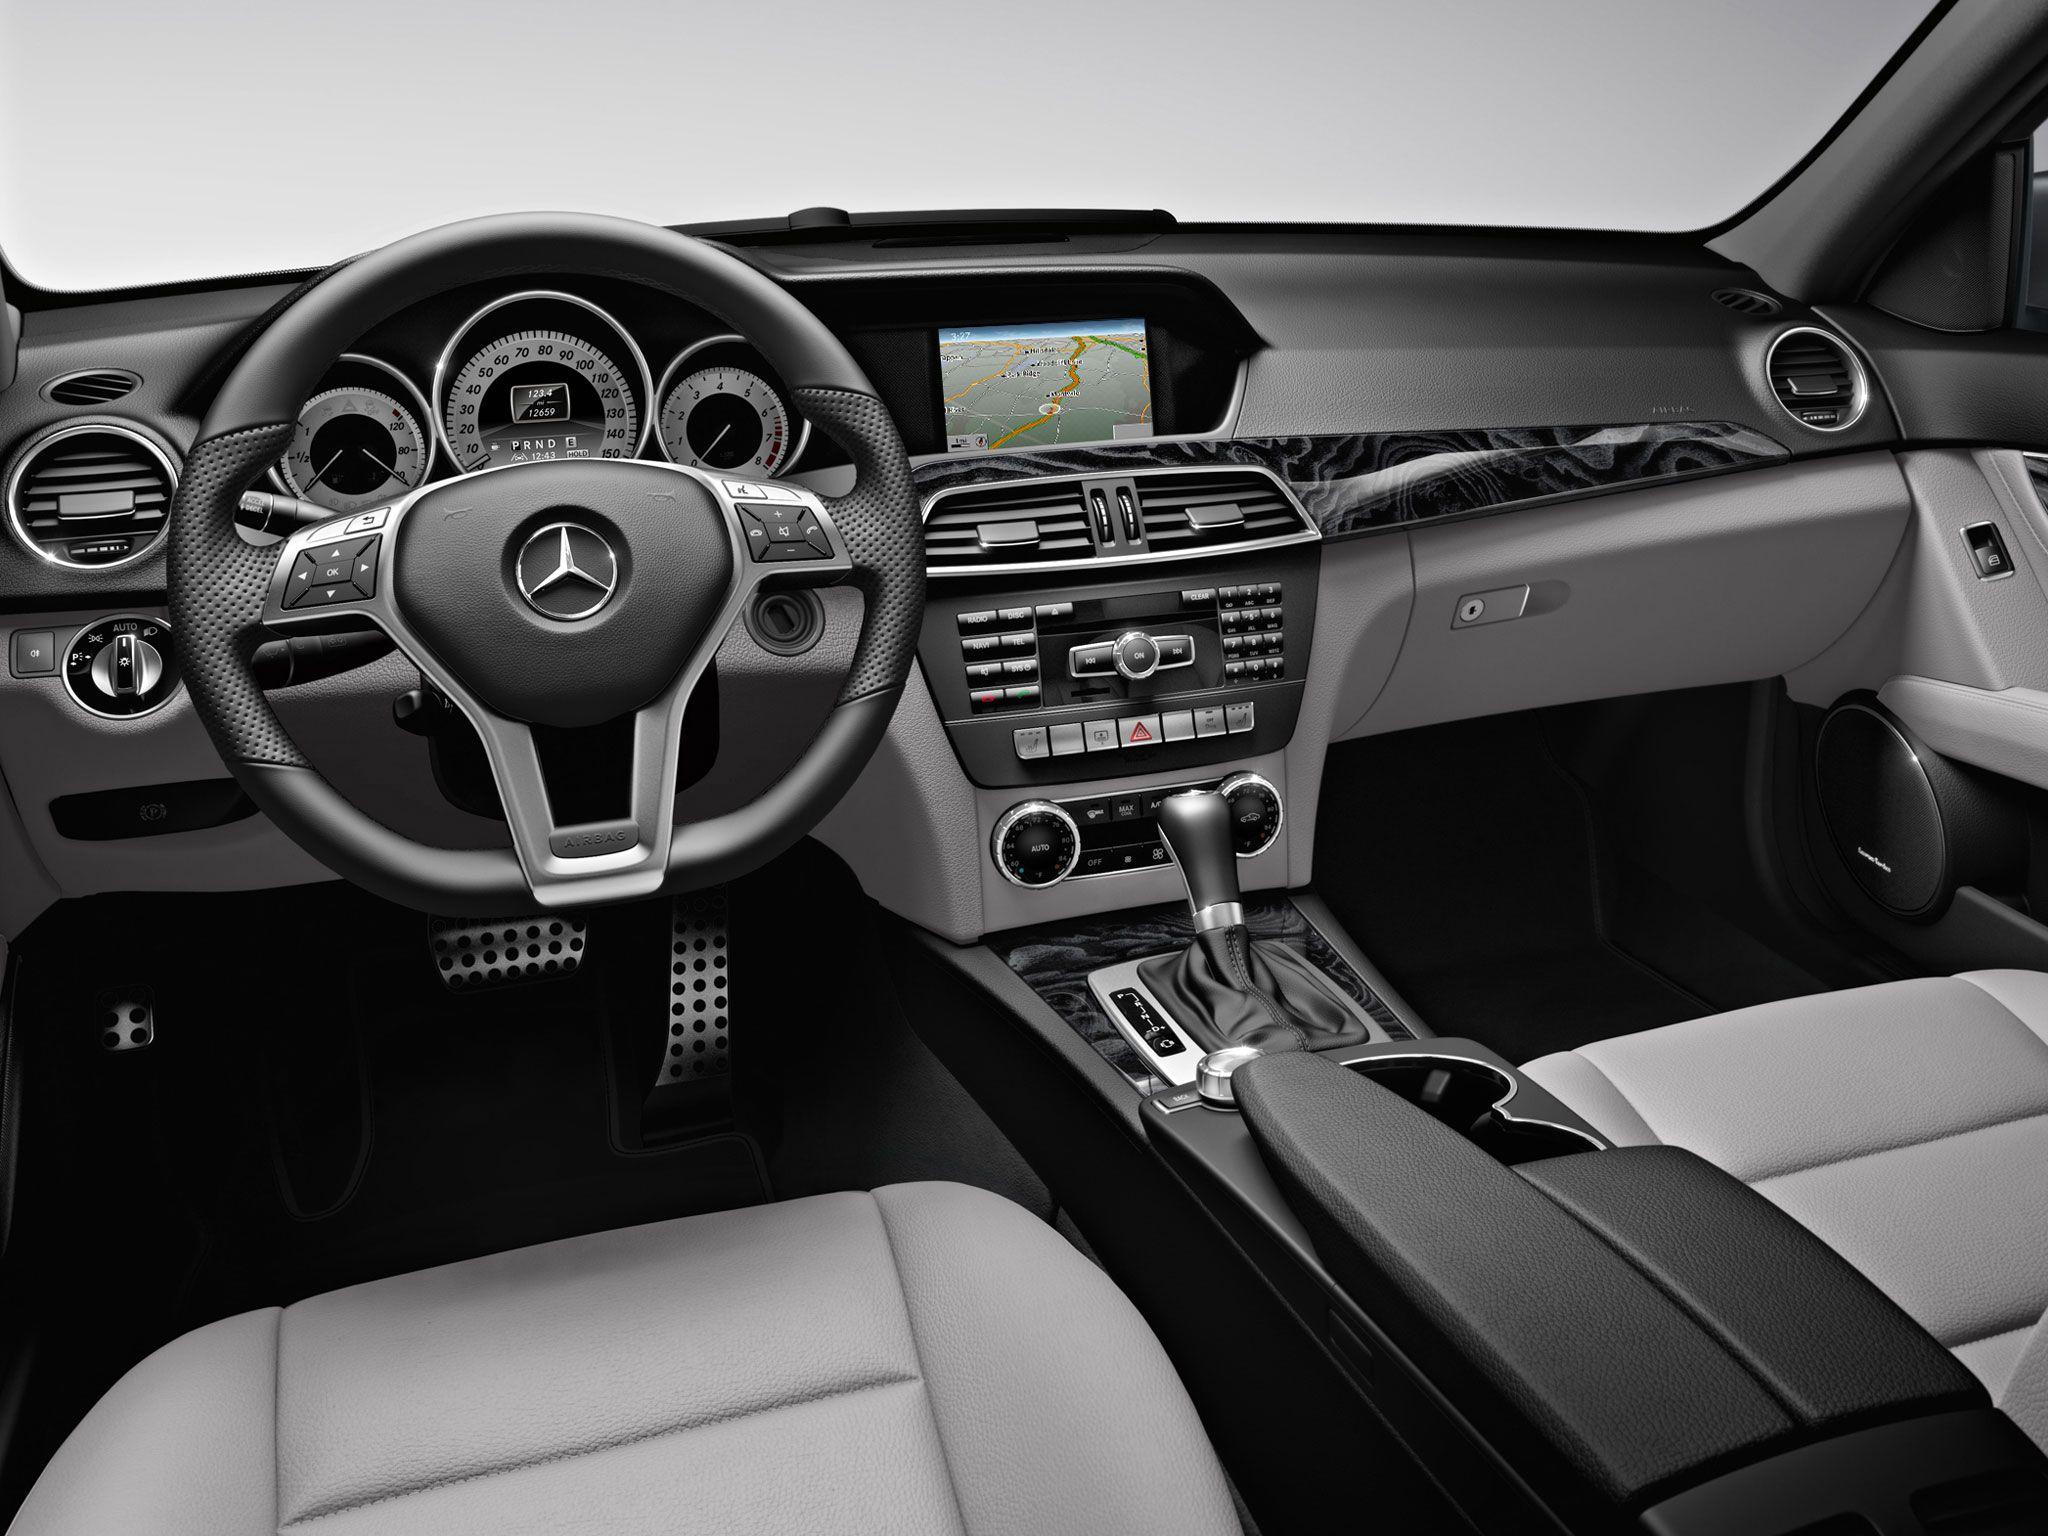 2013 Mercedes C350 Sedan Interior In Ash Leather My New Car